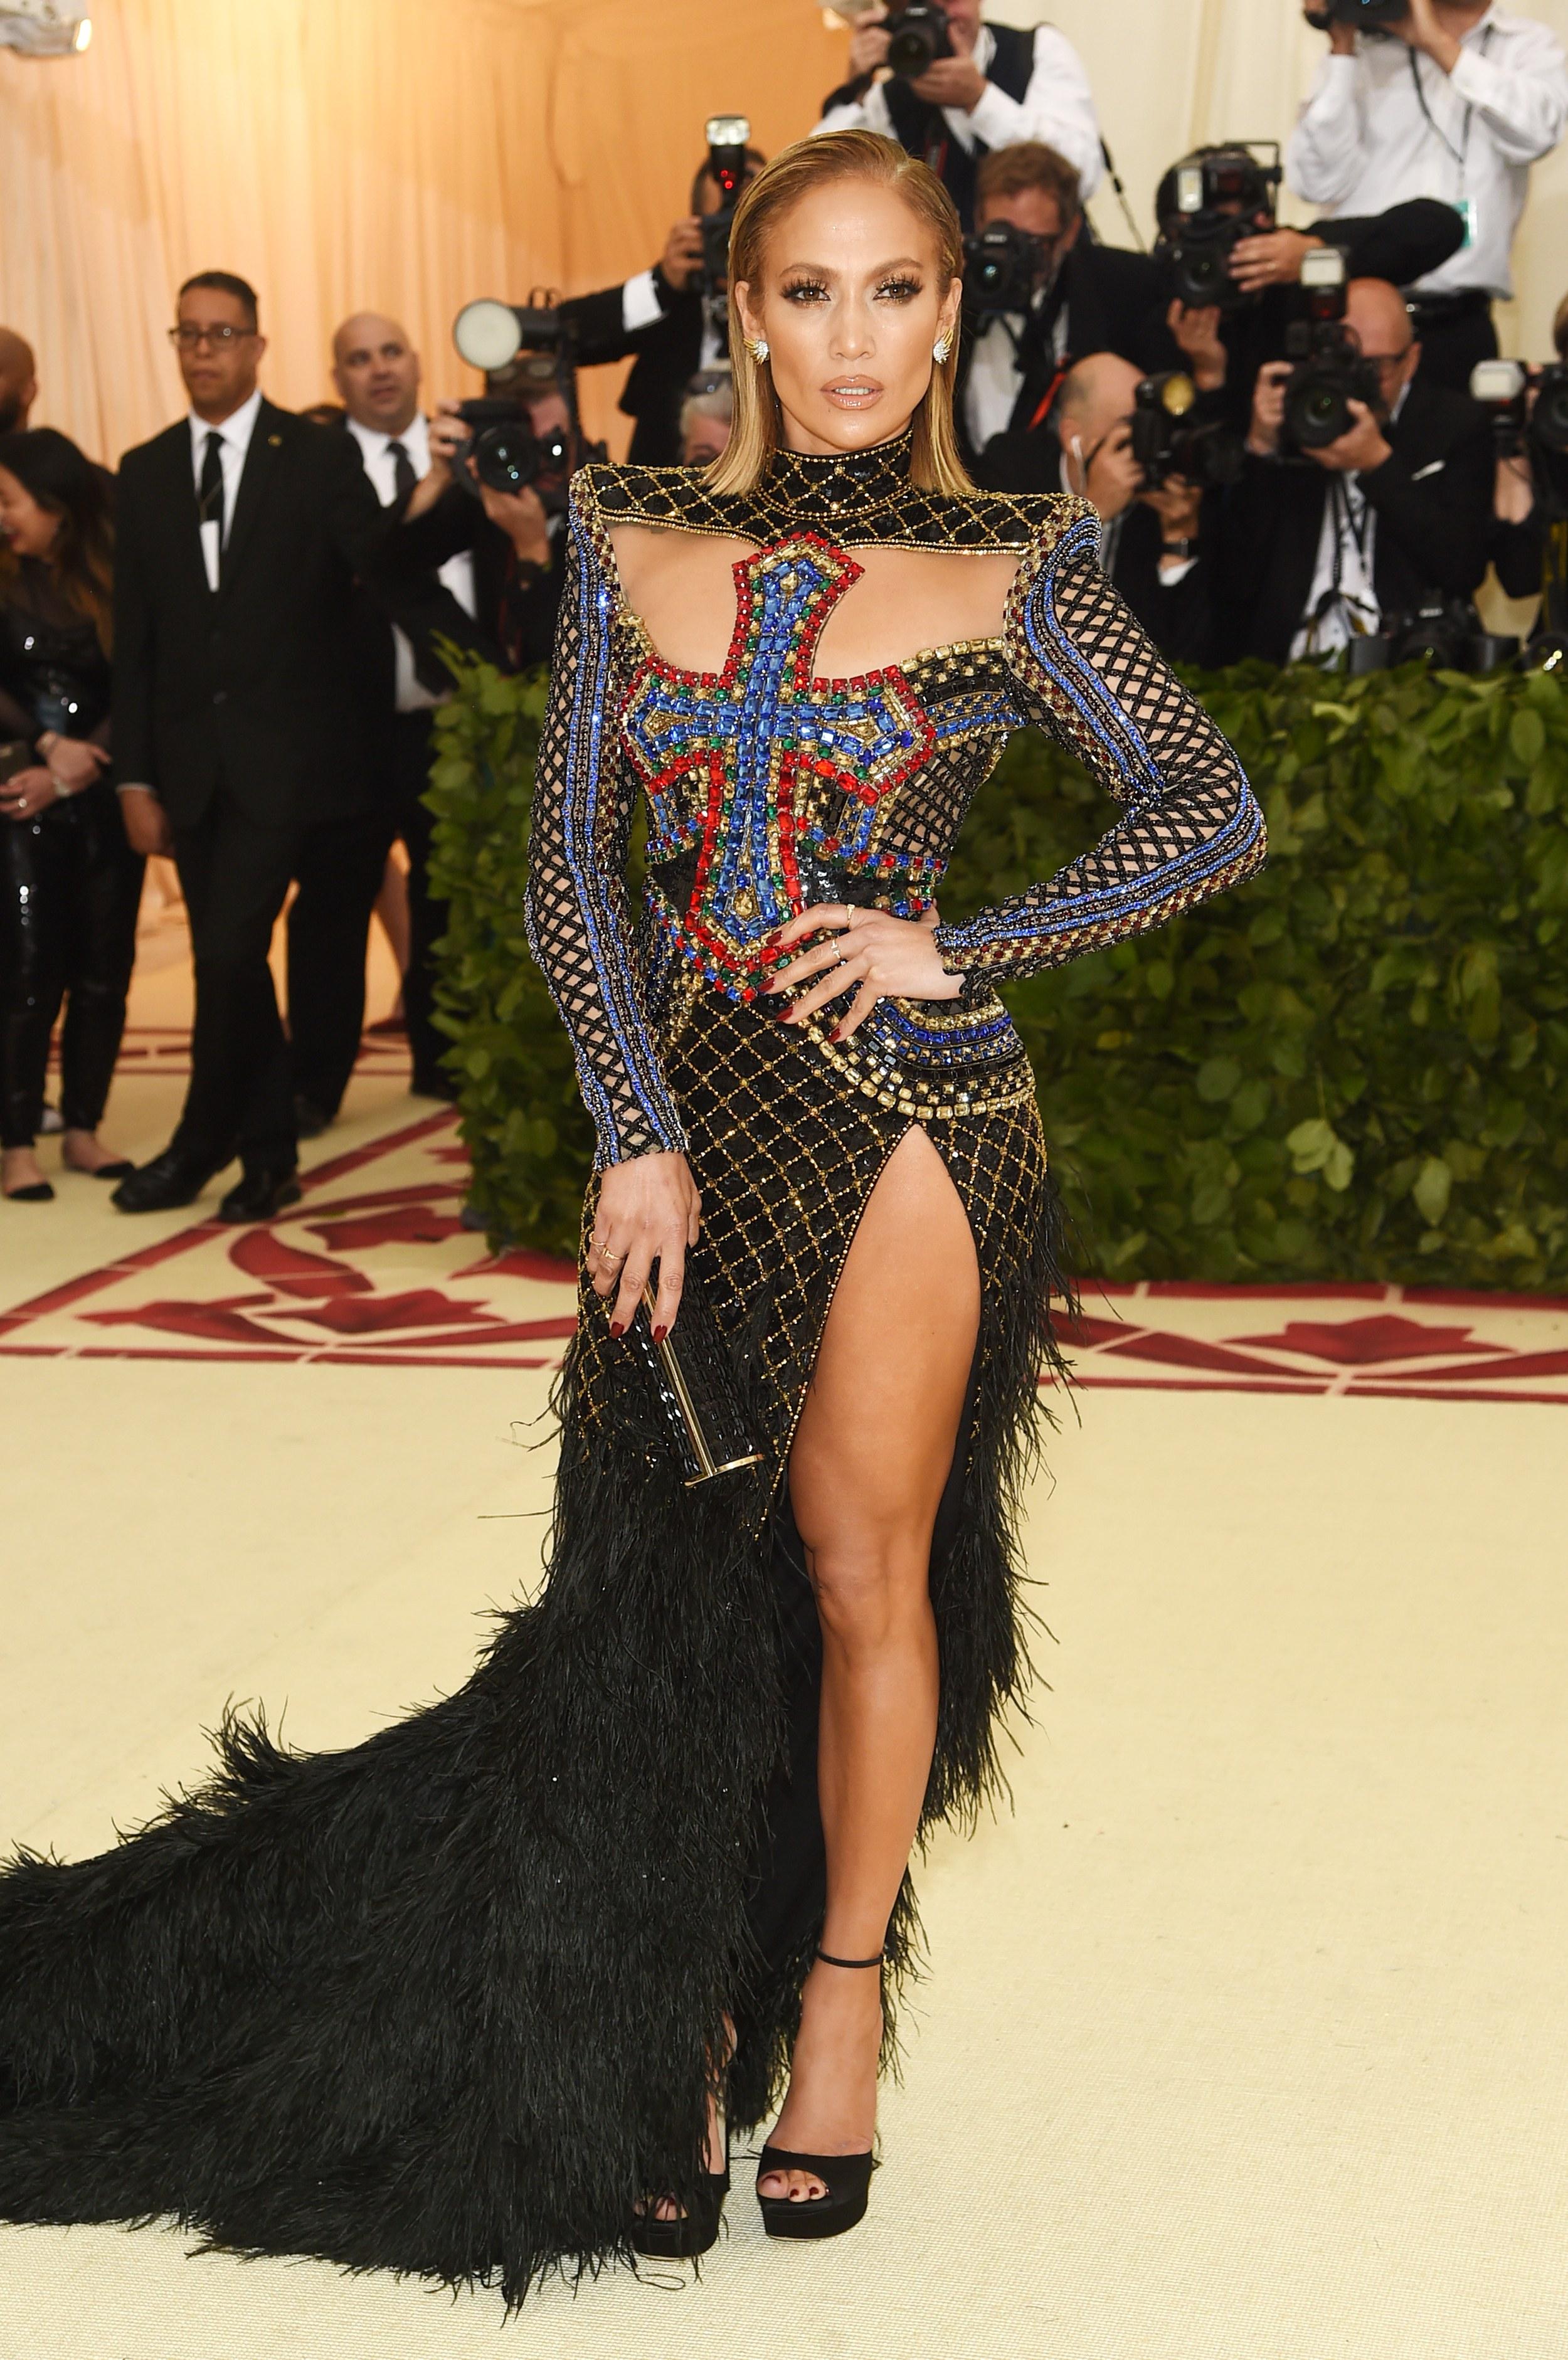 MG_Jennifer Lopez in Balmain and Jimmy Choo Shoes and Bag.jpg